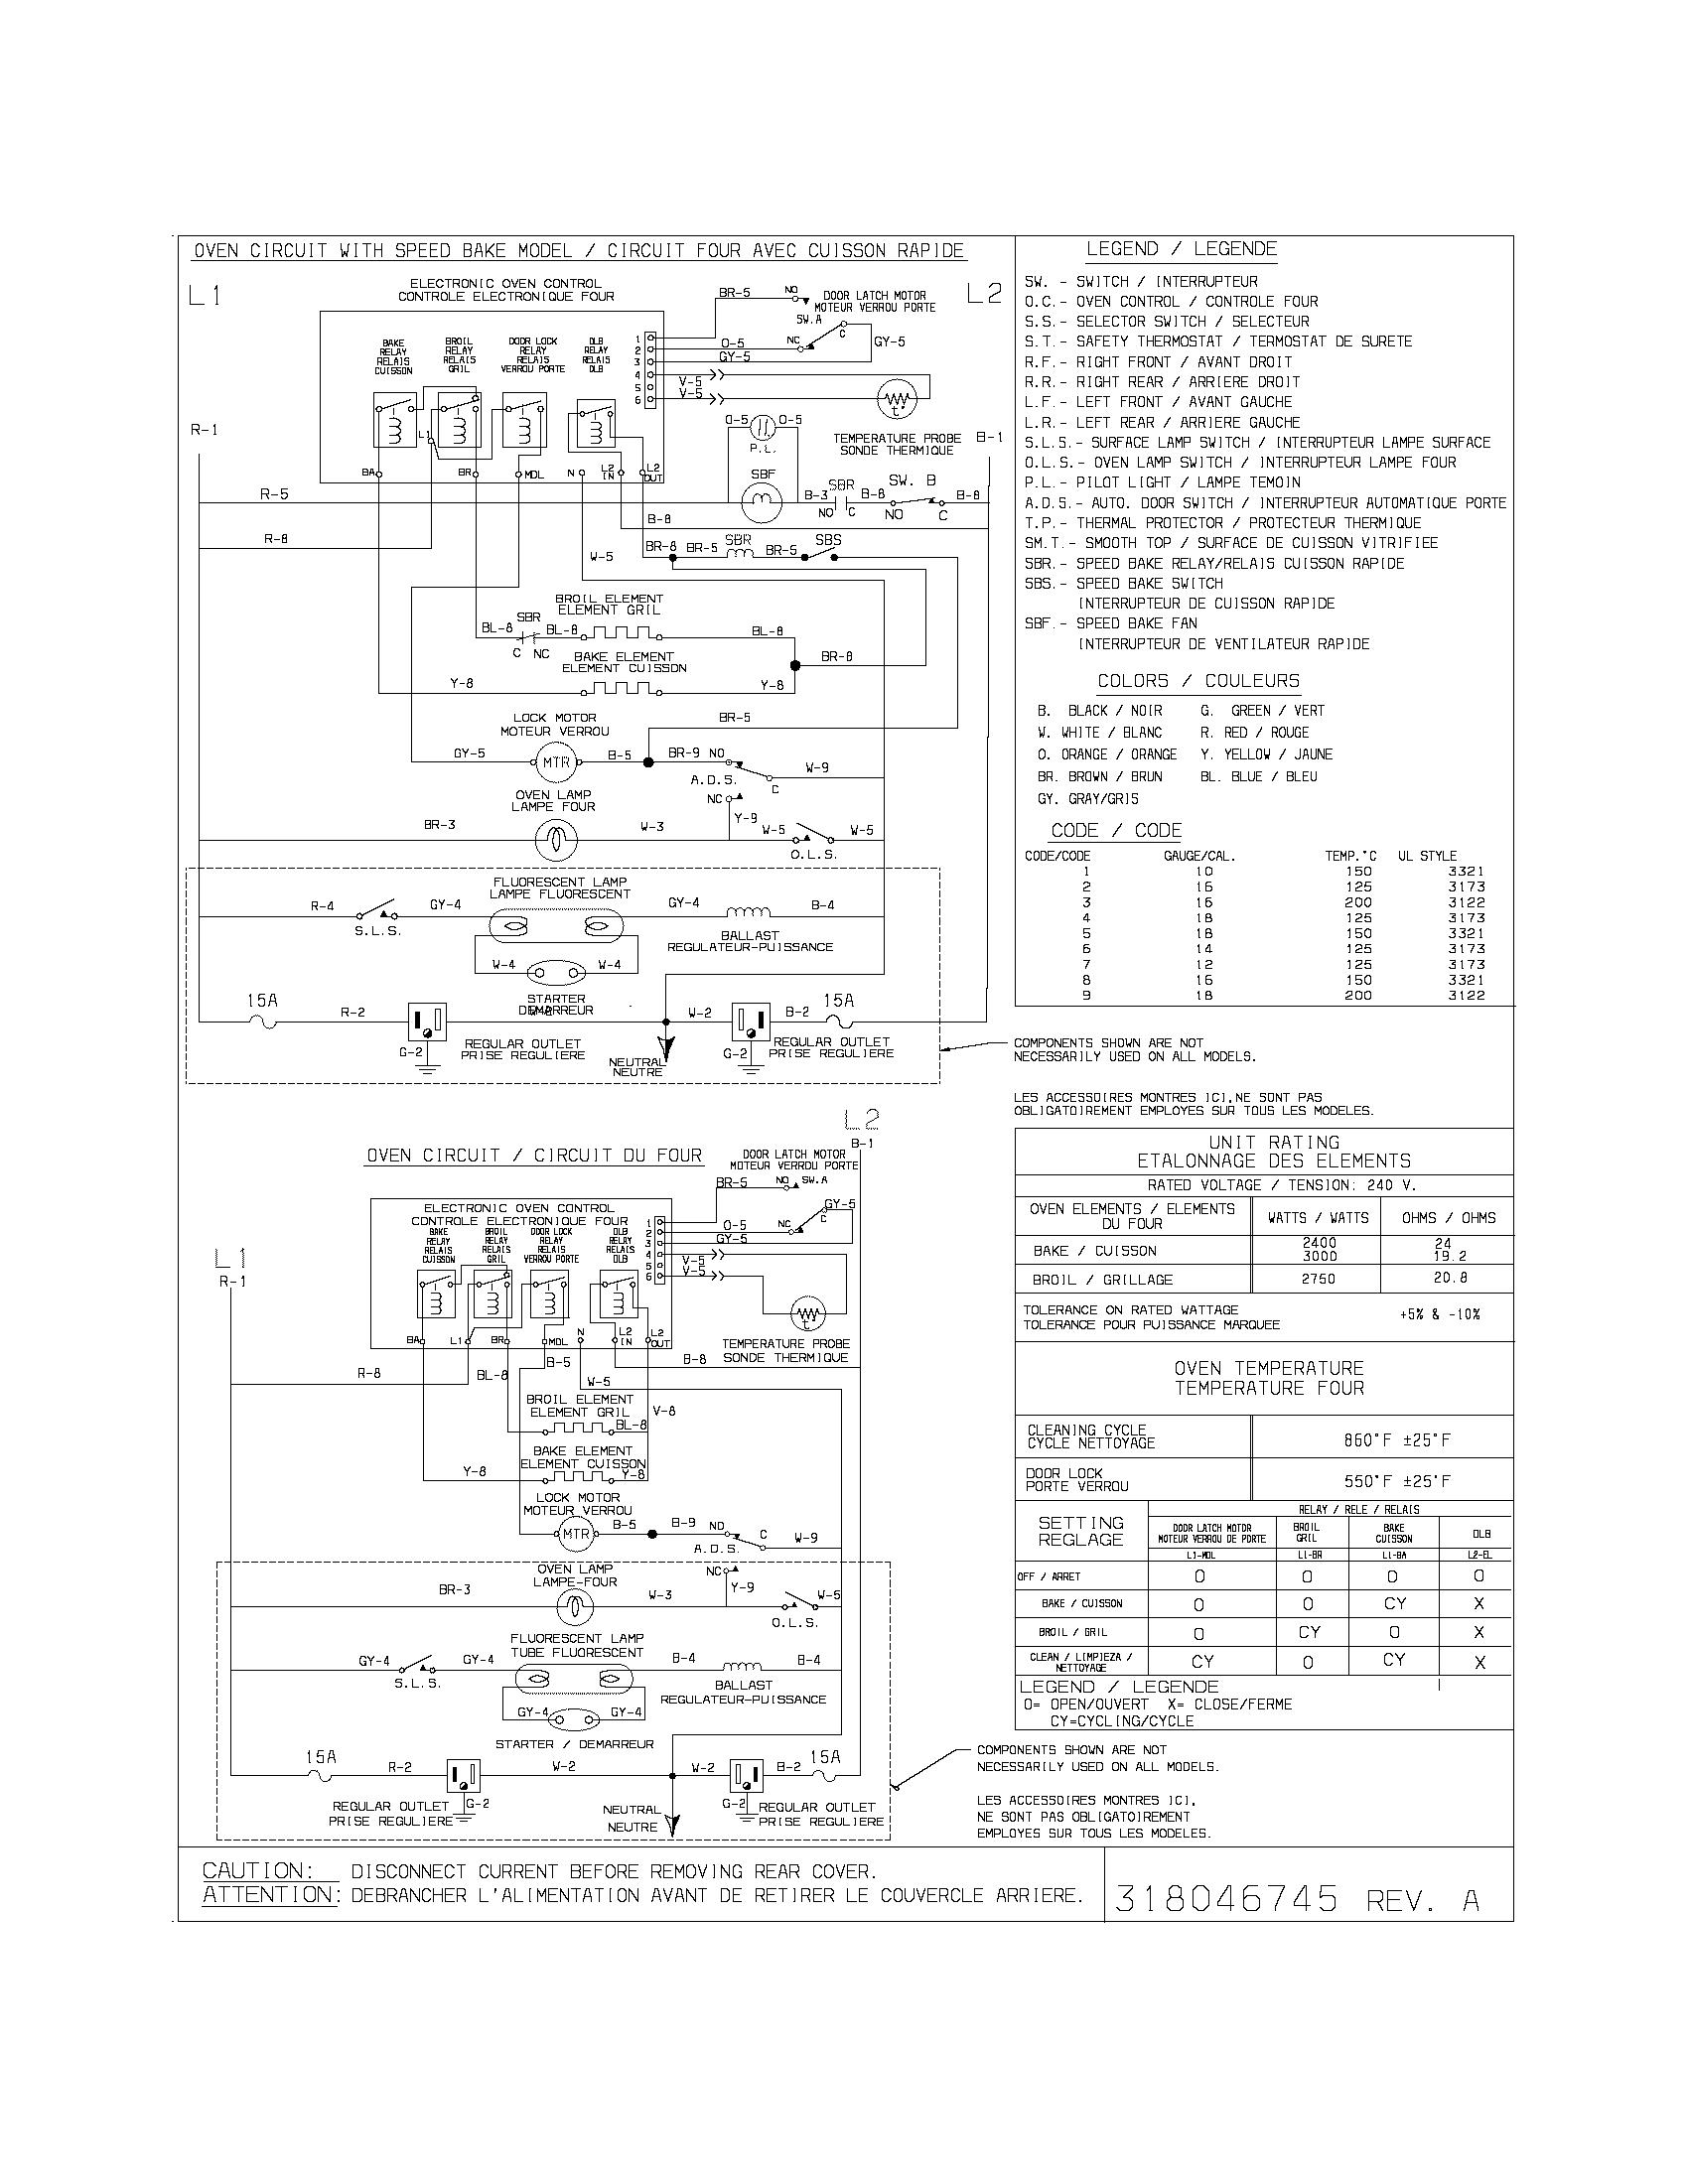 Ir Oven Wiring Diagram New 2 Humbucker Wiring Diagram